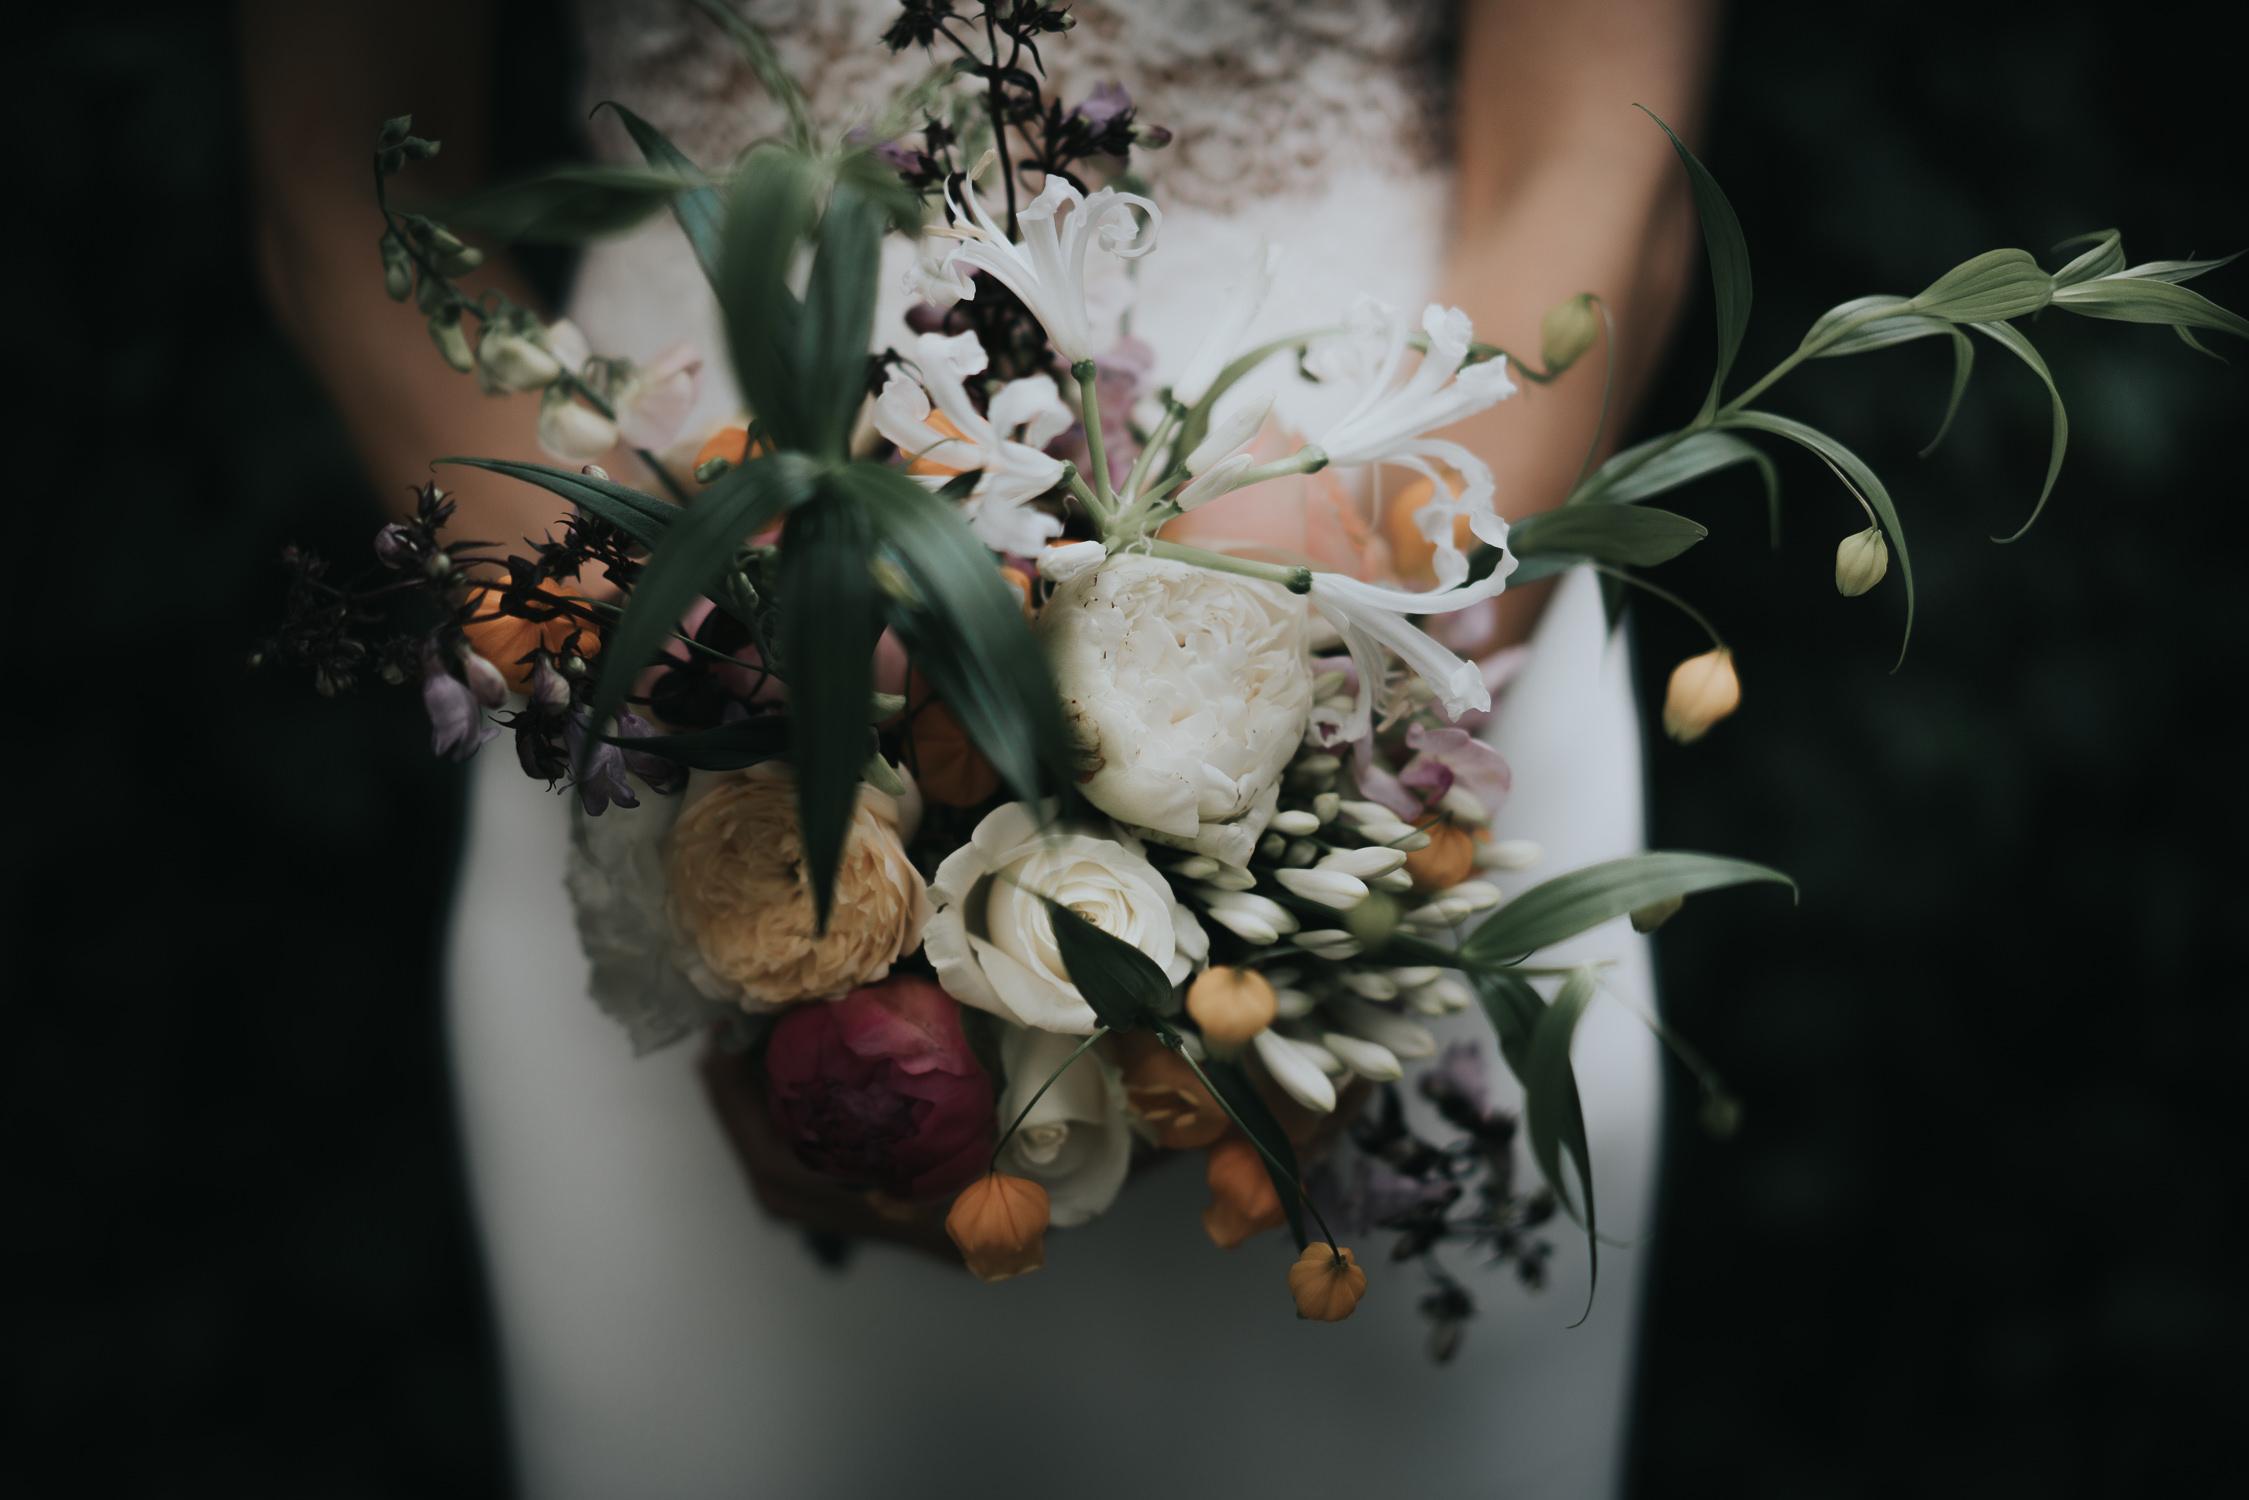 bruidsfotografie-amsterdam-utrecht-trouwfotograaf-mark-hadden-wedding-photography-mike-helen-258.jpg